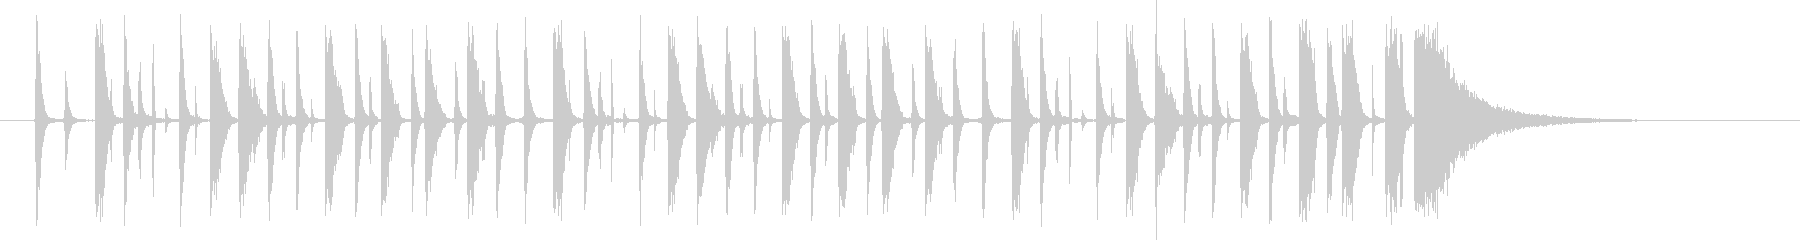 HHが効いた【生ドラム 】ループ音源の未再生の波形